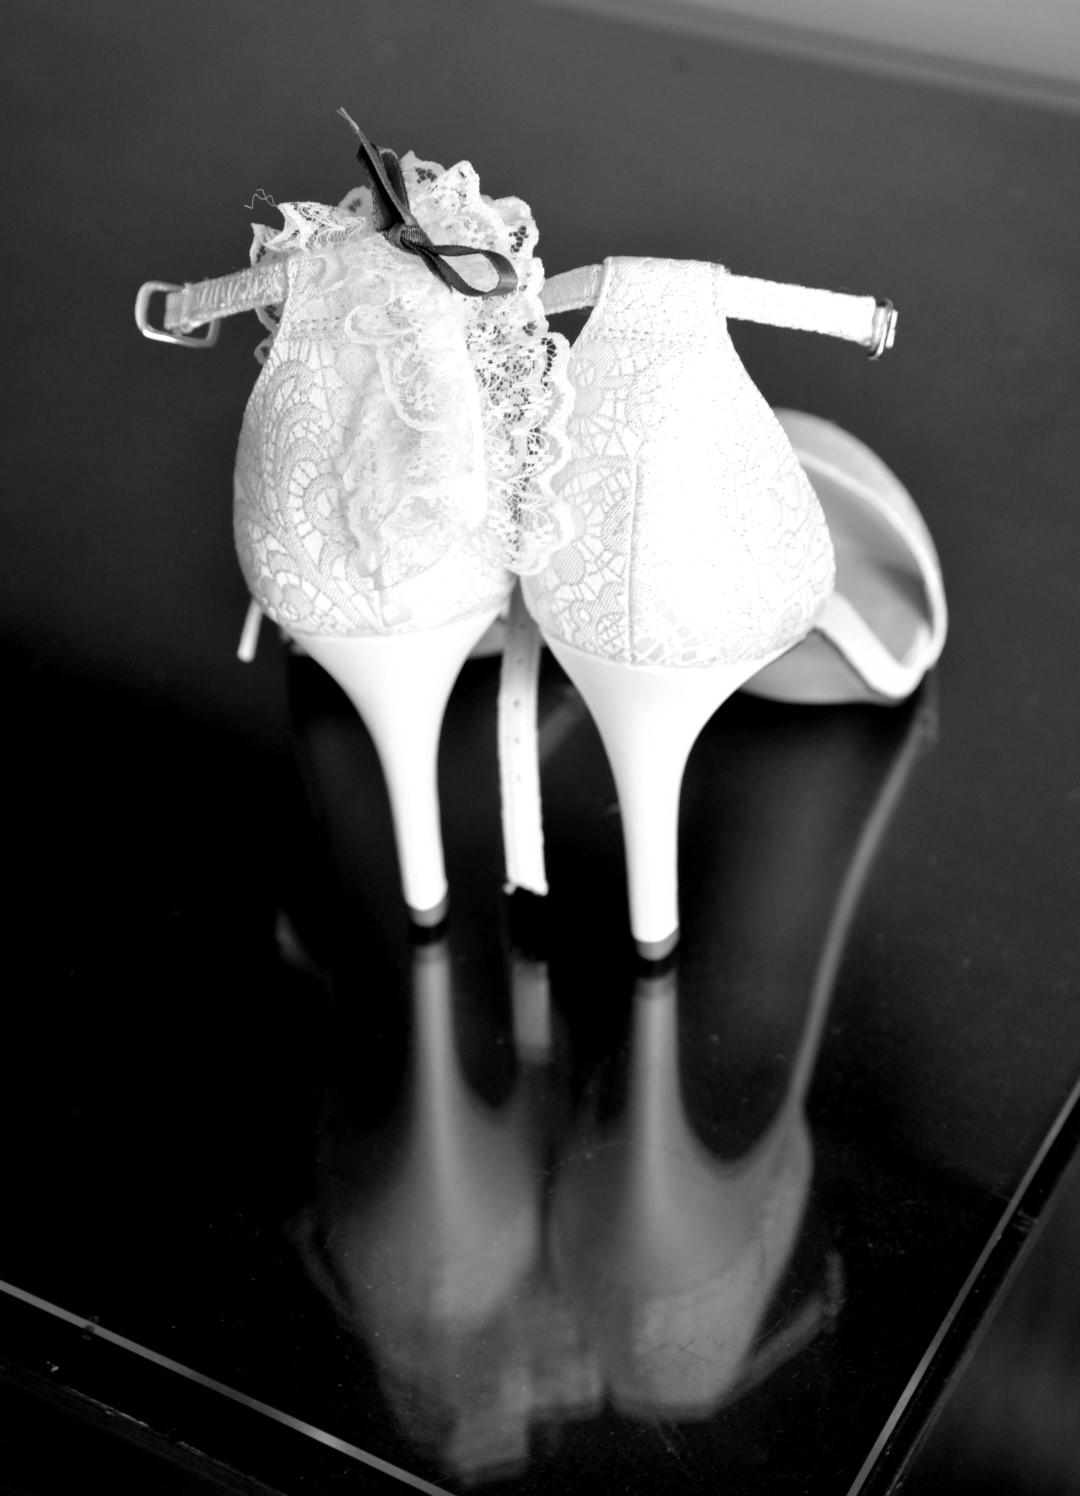 york-wedding-photographer-marriott-hotel-bridal-preps-shoes